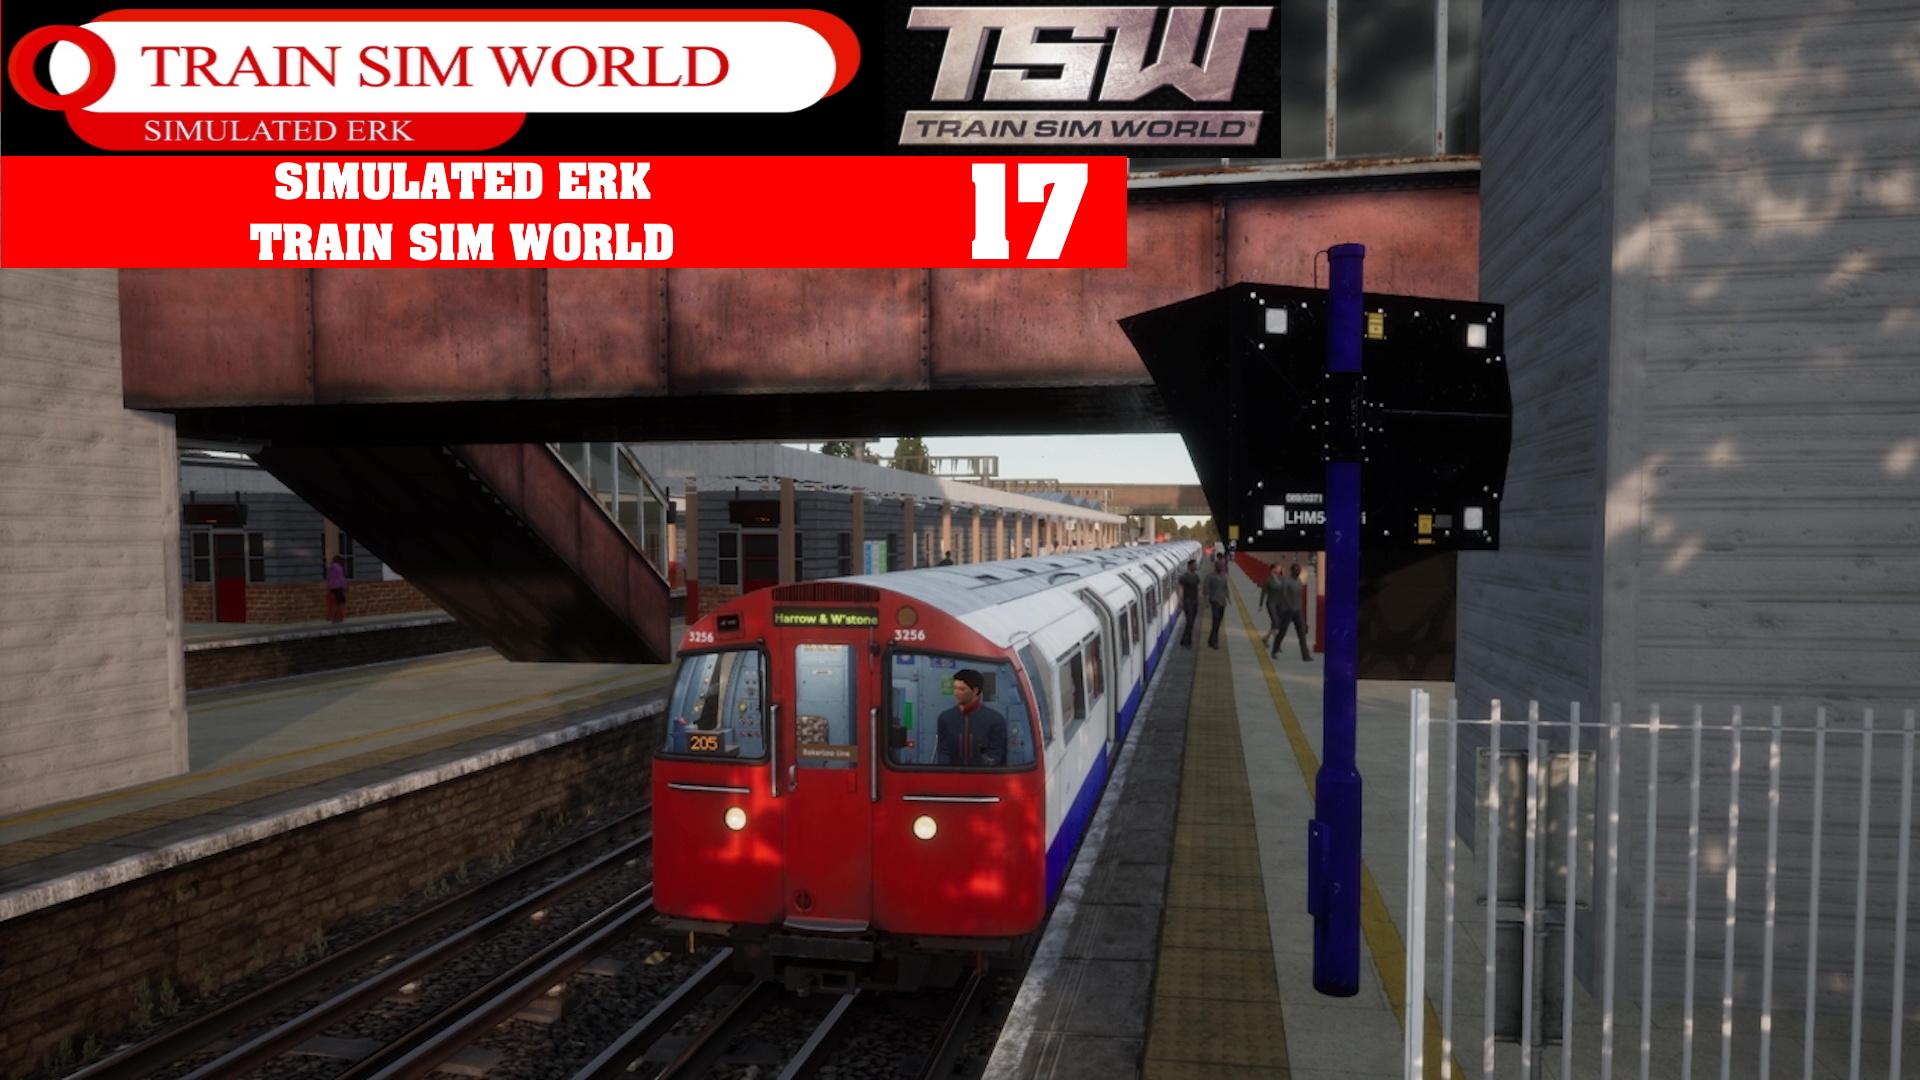 Simulated Erk: Train Sim World episode 17 | Mind The Gap, Please!